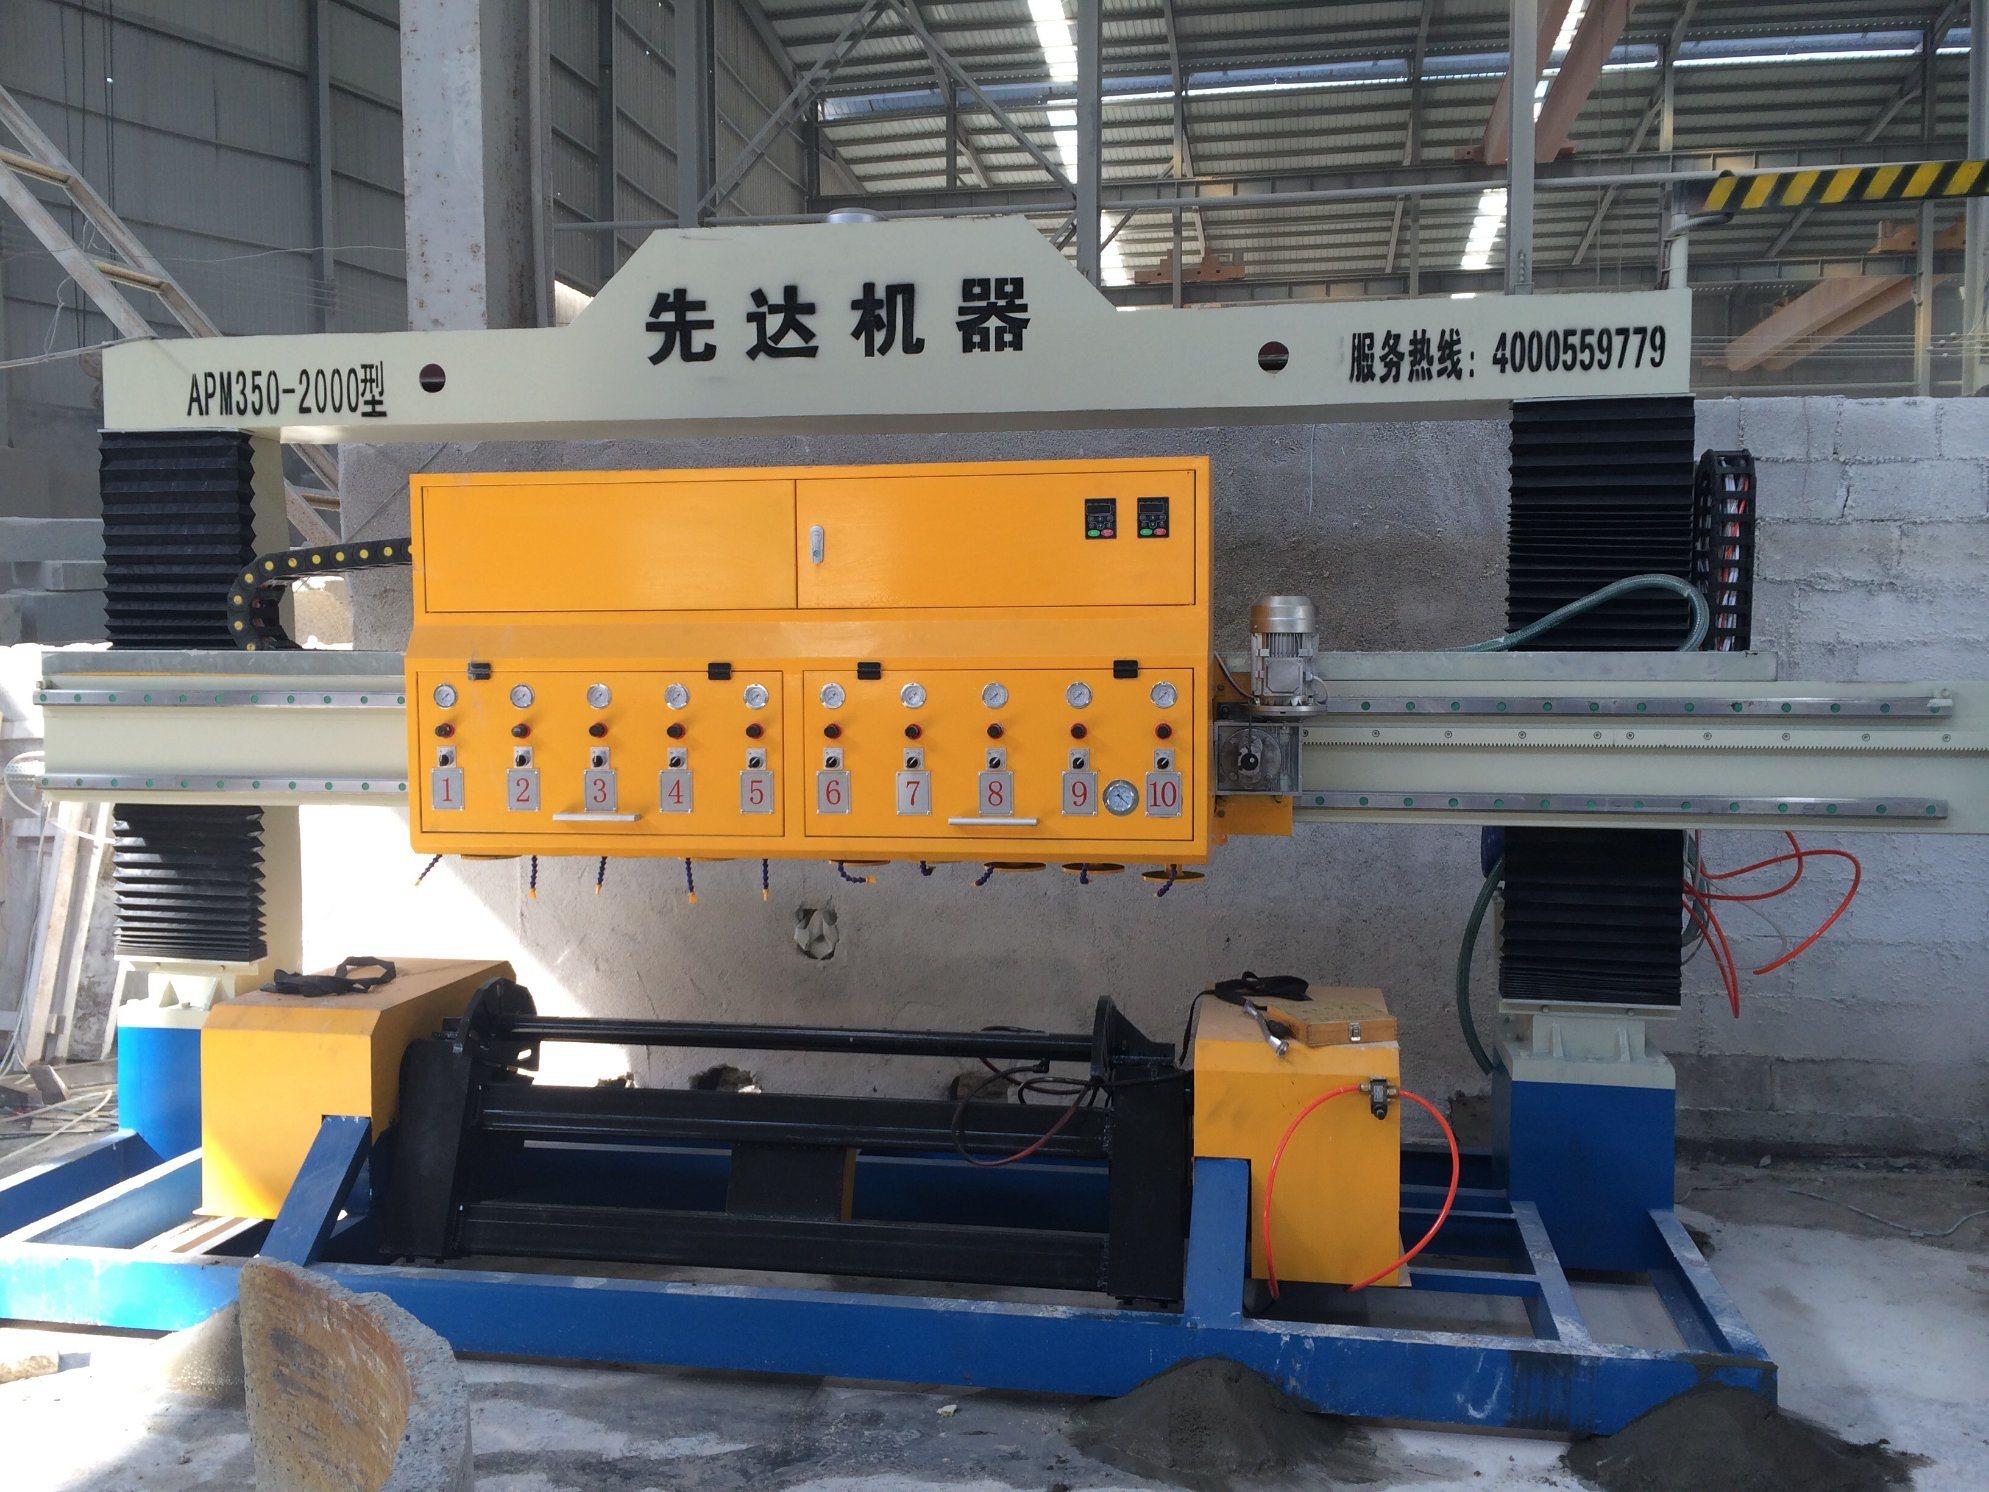 Apm-350-2000-12 Mable Granite Stone Polishing Grinder Machinery